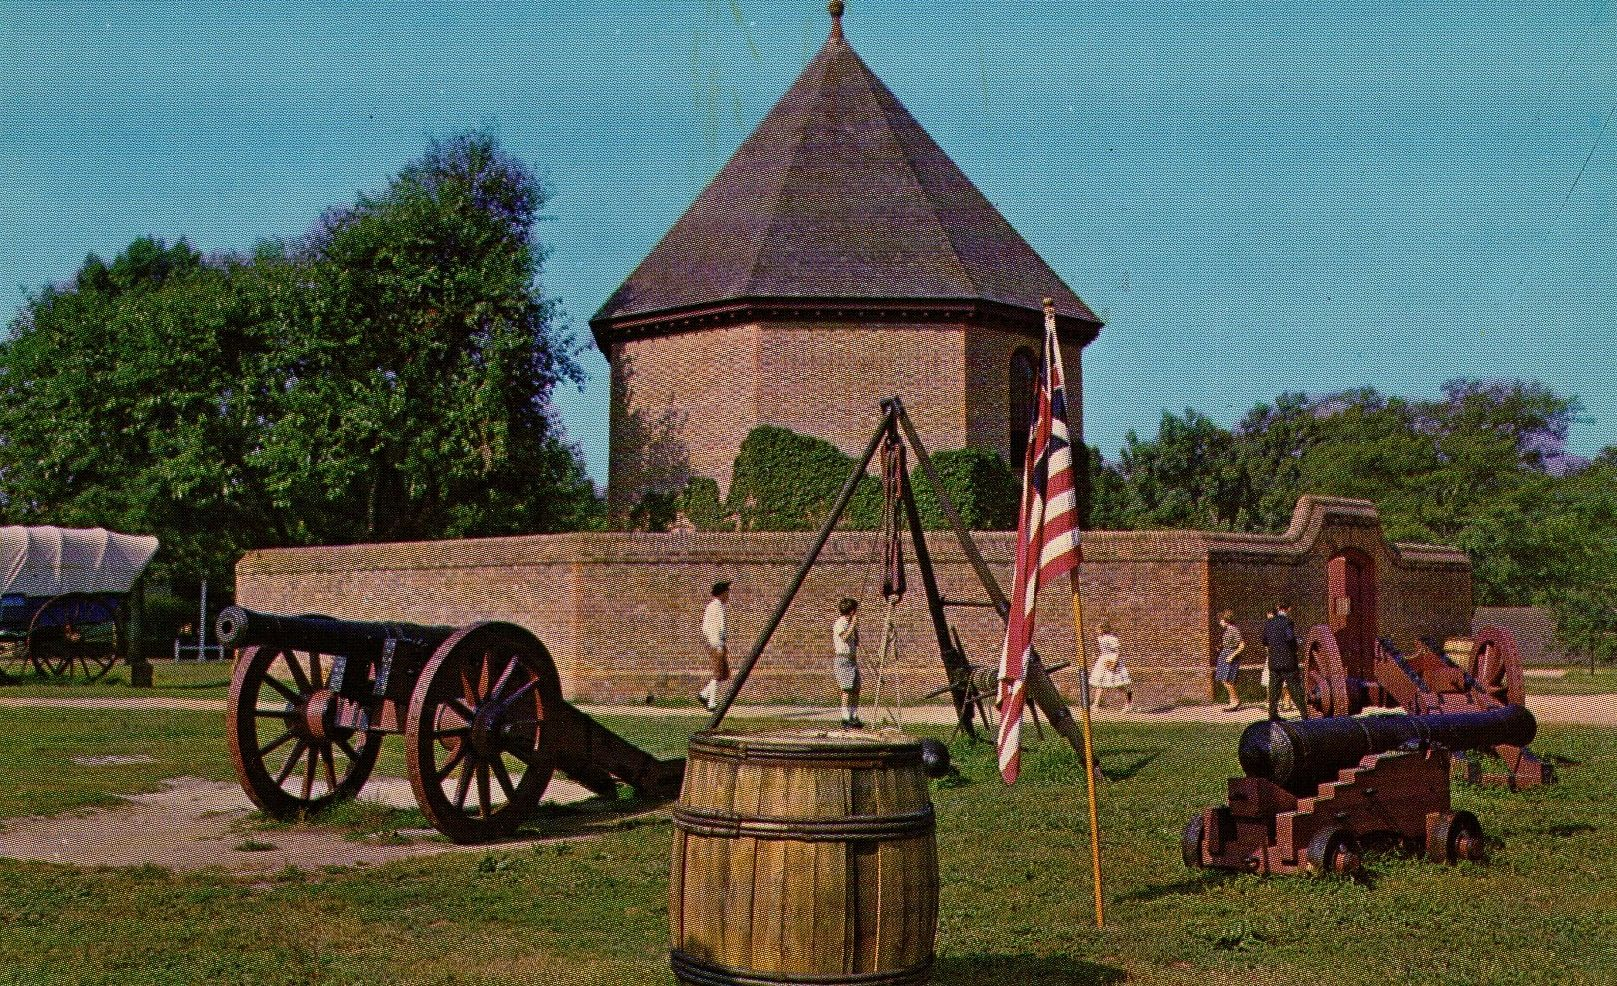 Powder Magazine, Williamsburg, VA Postcard, Williamsburg